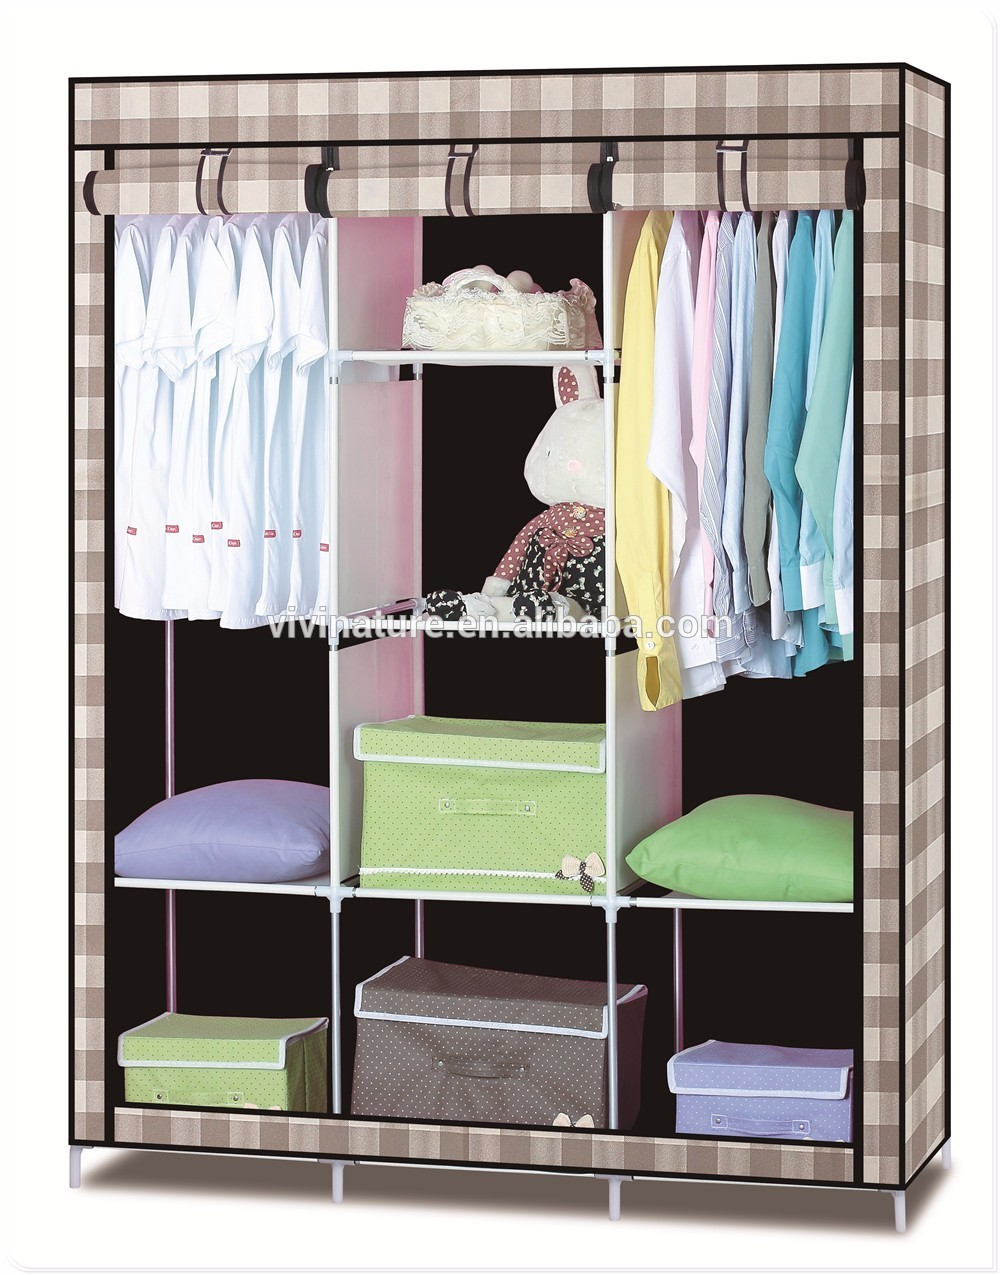 New Design Canvas Wardrobe Useful Clothes Storage Cabinet Wardrobe House Easy Taking Wardrobe